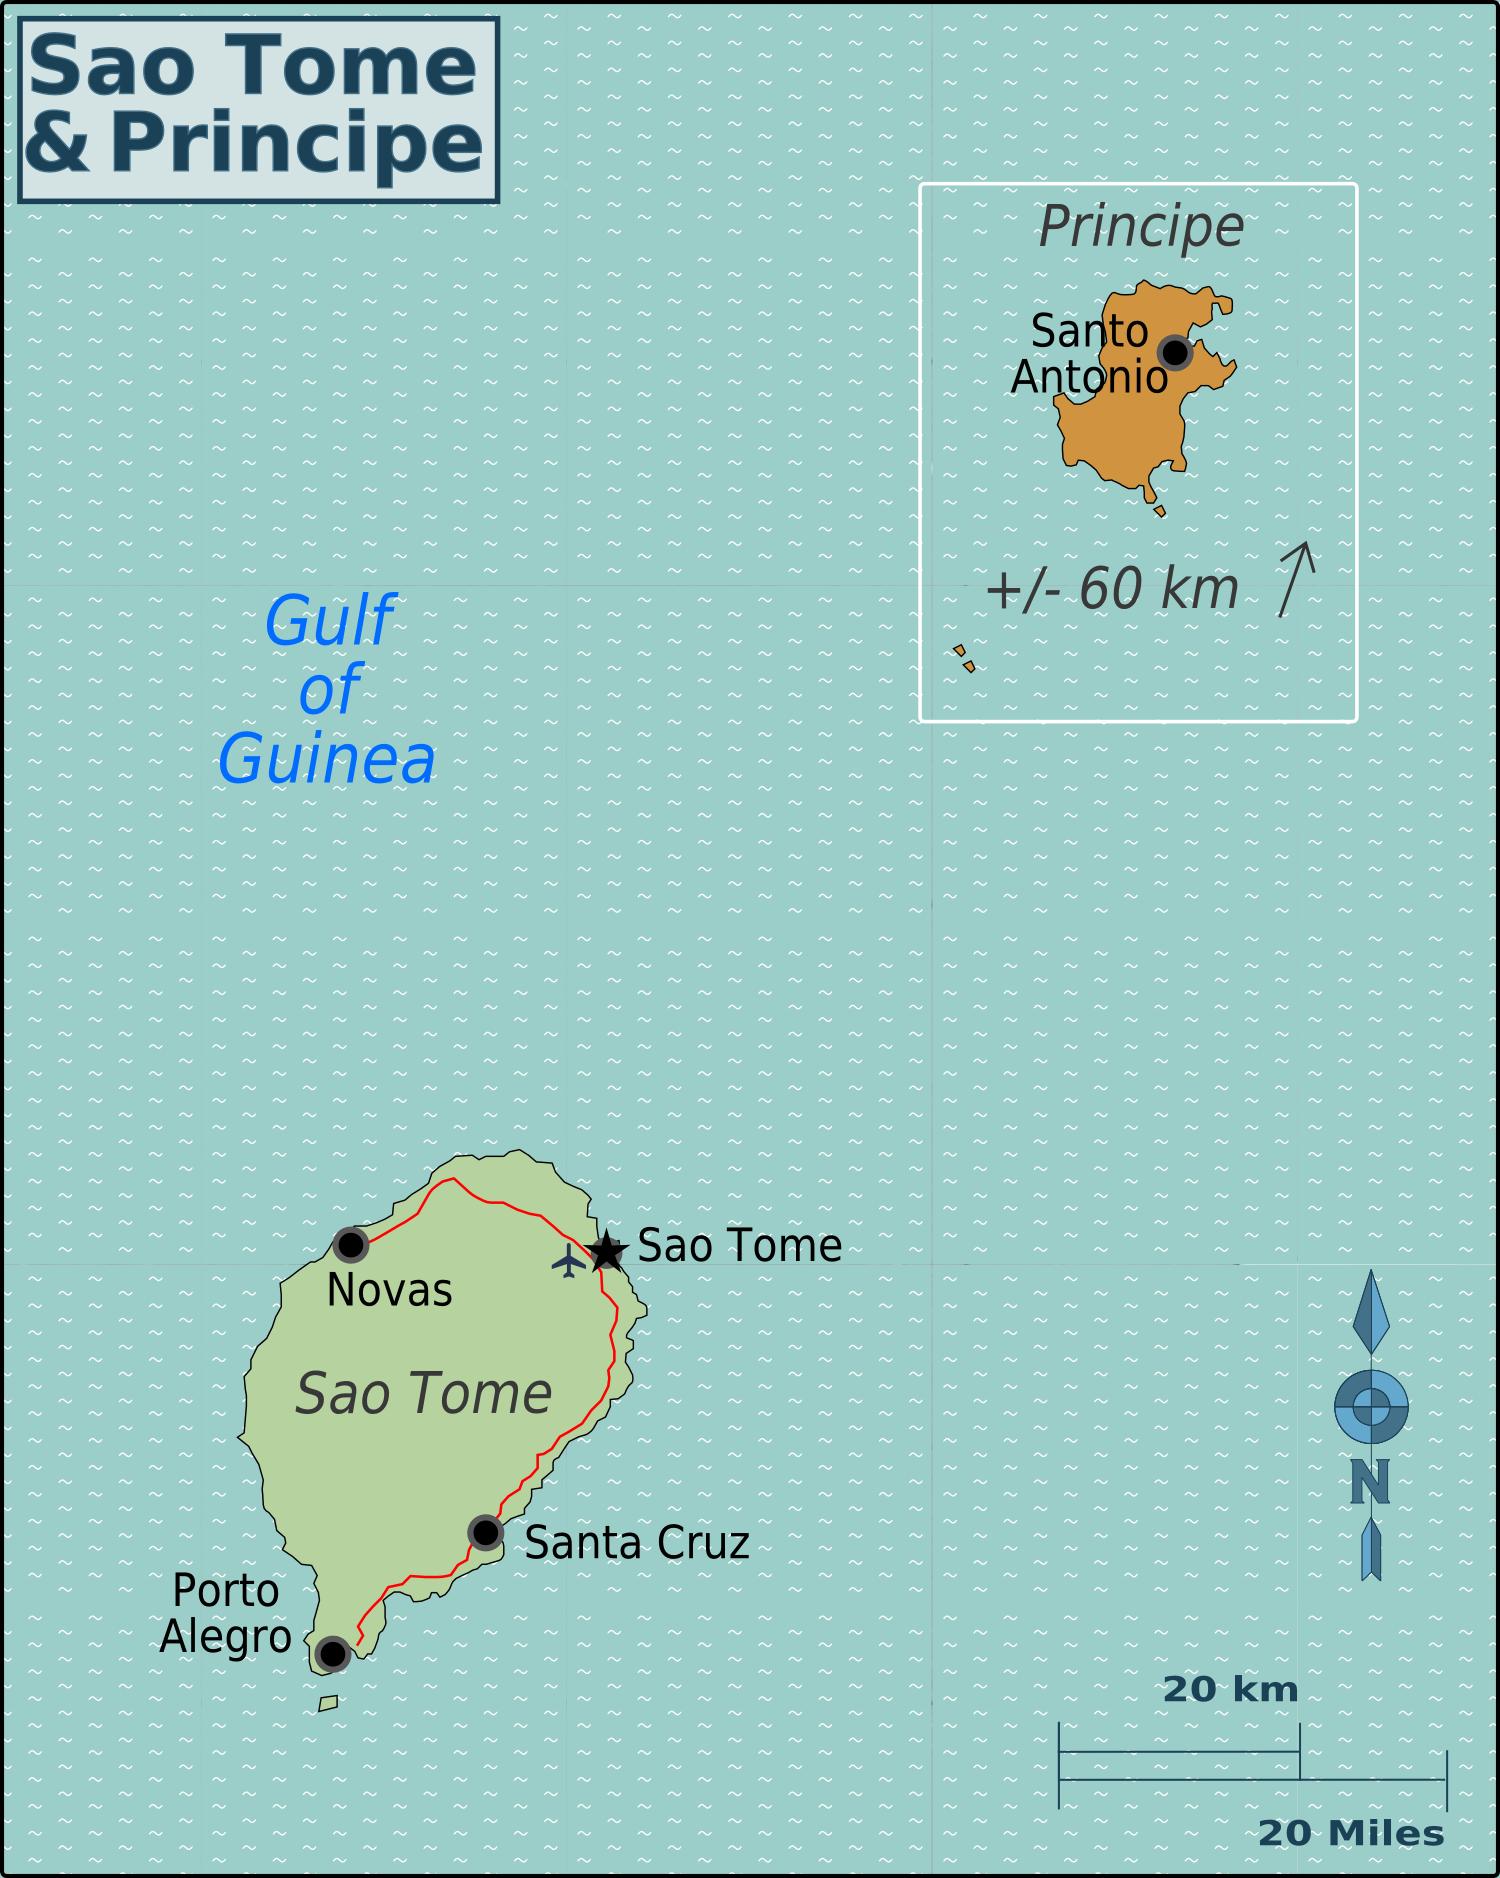 File:Sao Tome and Principe Regions map.png - Wikimedia Commons on seychelles map, saudi arabia map, comoros map, bangladesh map, central african republic map, new britain island map, lesotho map, united arab emirates map, tanzania map, trinidad & tobago map, honshu island map, principe island map, hong kong map, eritrea map, tokelau map, u.a.e. map, sri lanka map, tunisia map, niue map,